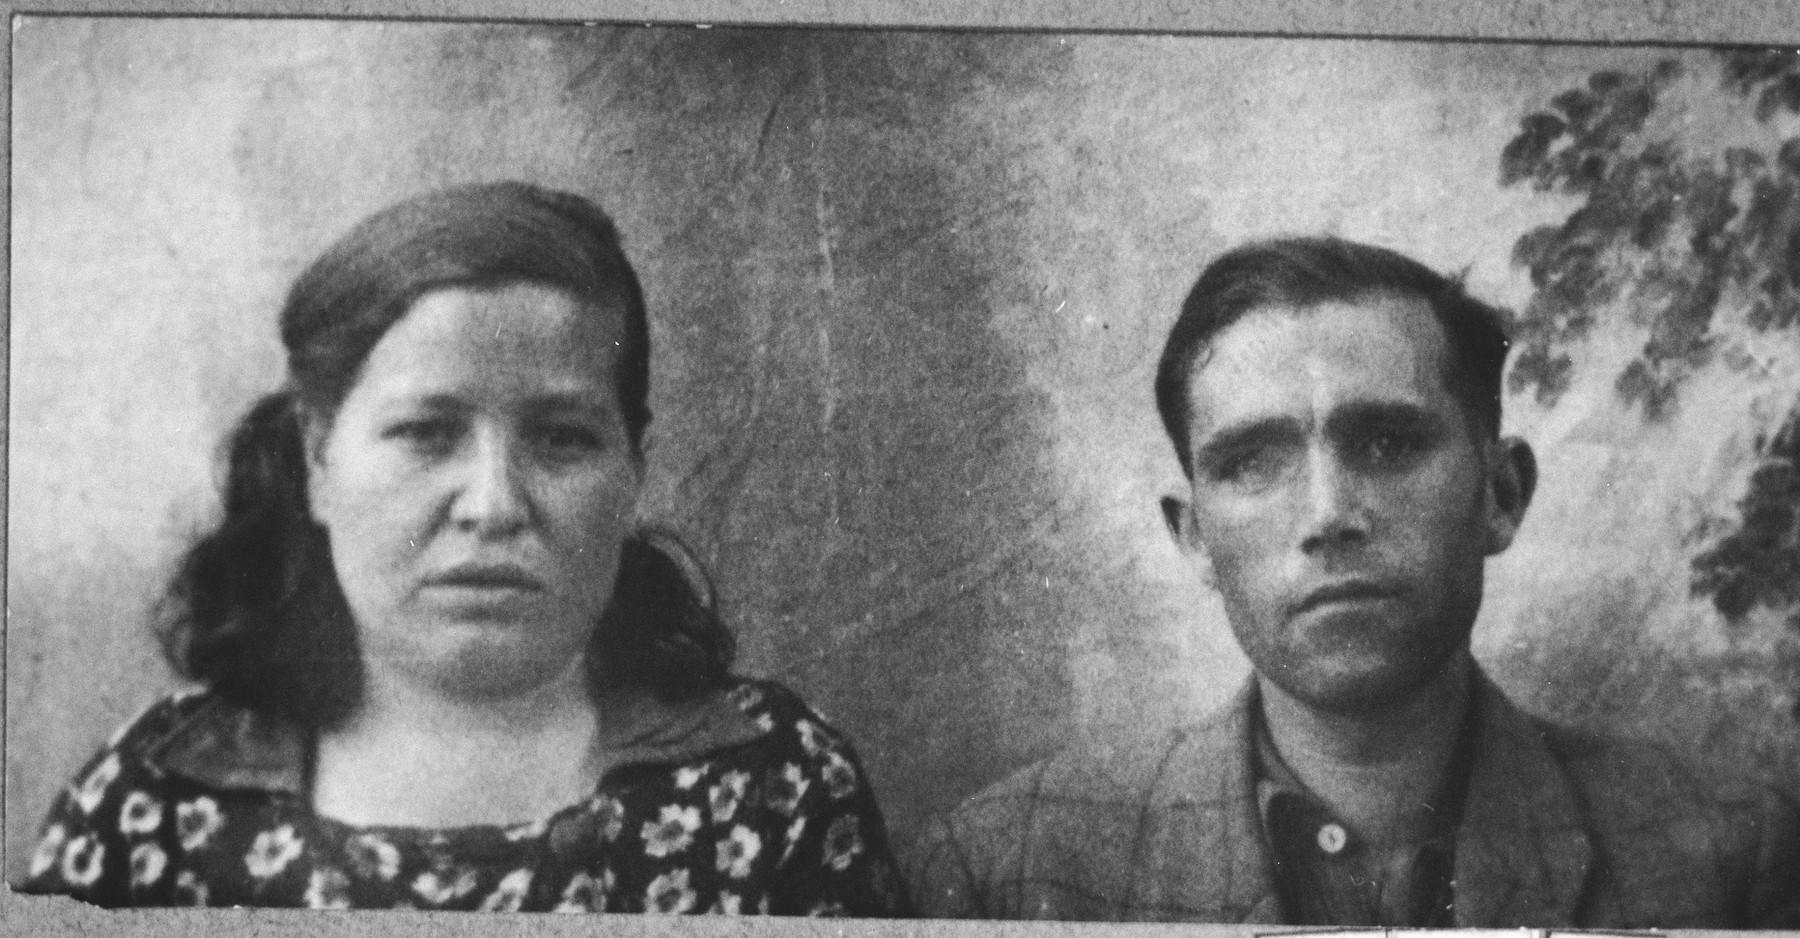 Portrait of Solomon Katan, son of Haim Katan, and Solomon's wife, Palomba.  They lived at Karagoryeva 95 in Bitola.